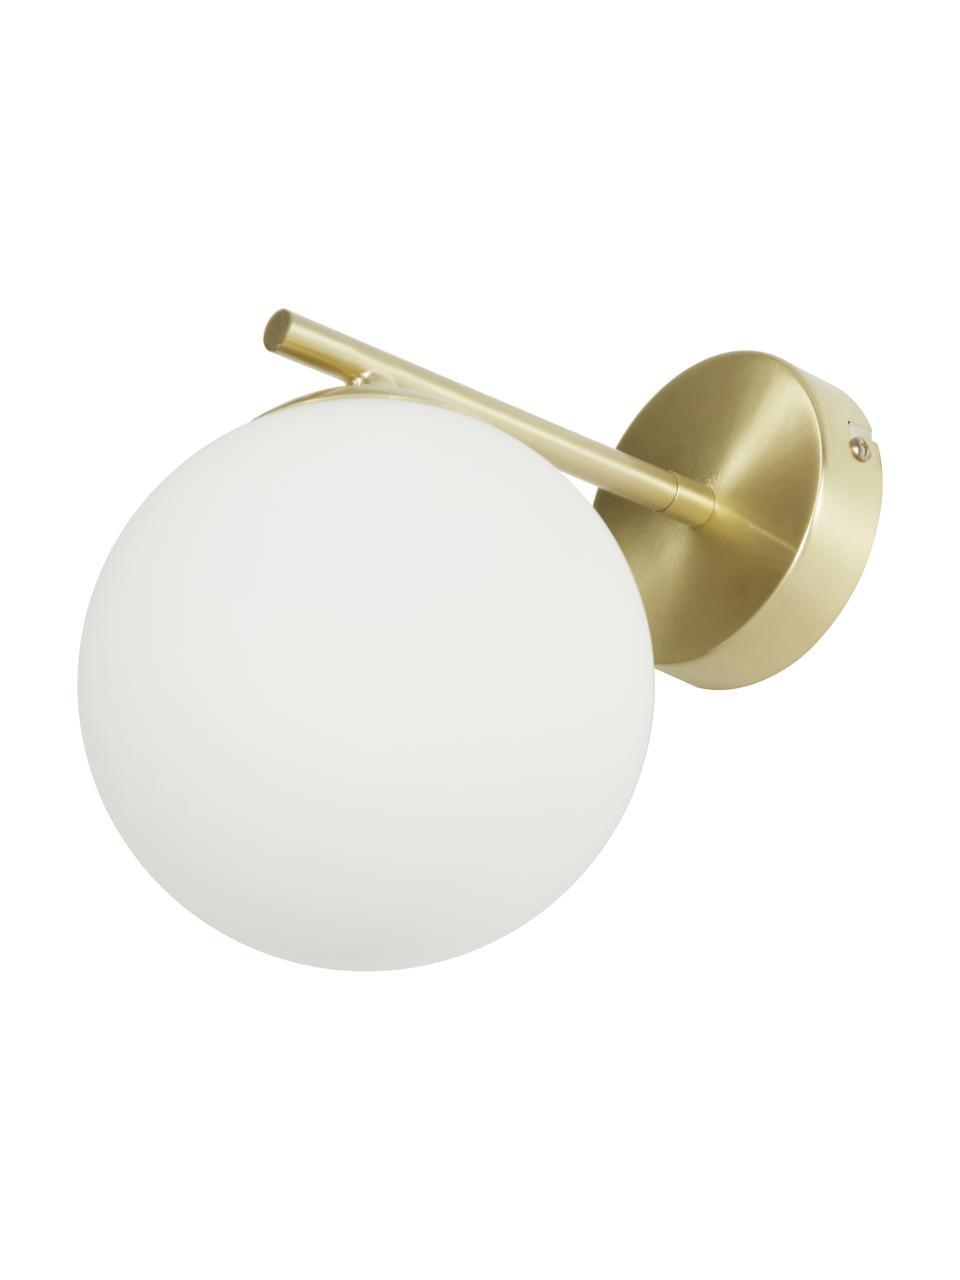 Wandleuchte Liv aus Opalglas, Lampenschirm: Glas, Gestell: Metall, gebürstet, Weiß, Messing, 15 x 22 cm